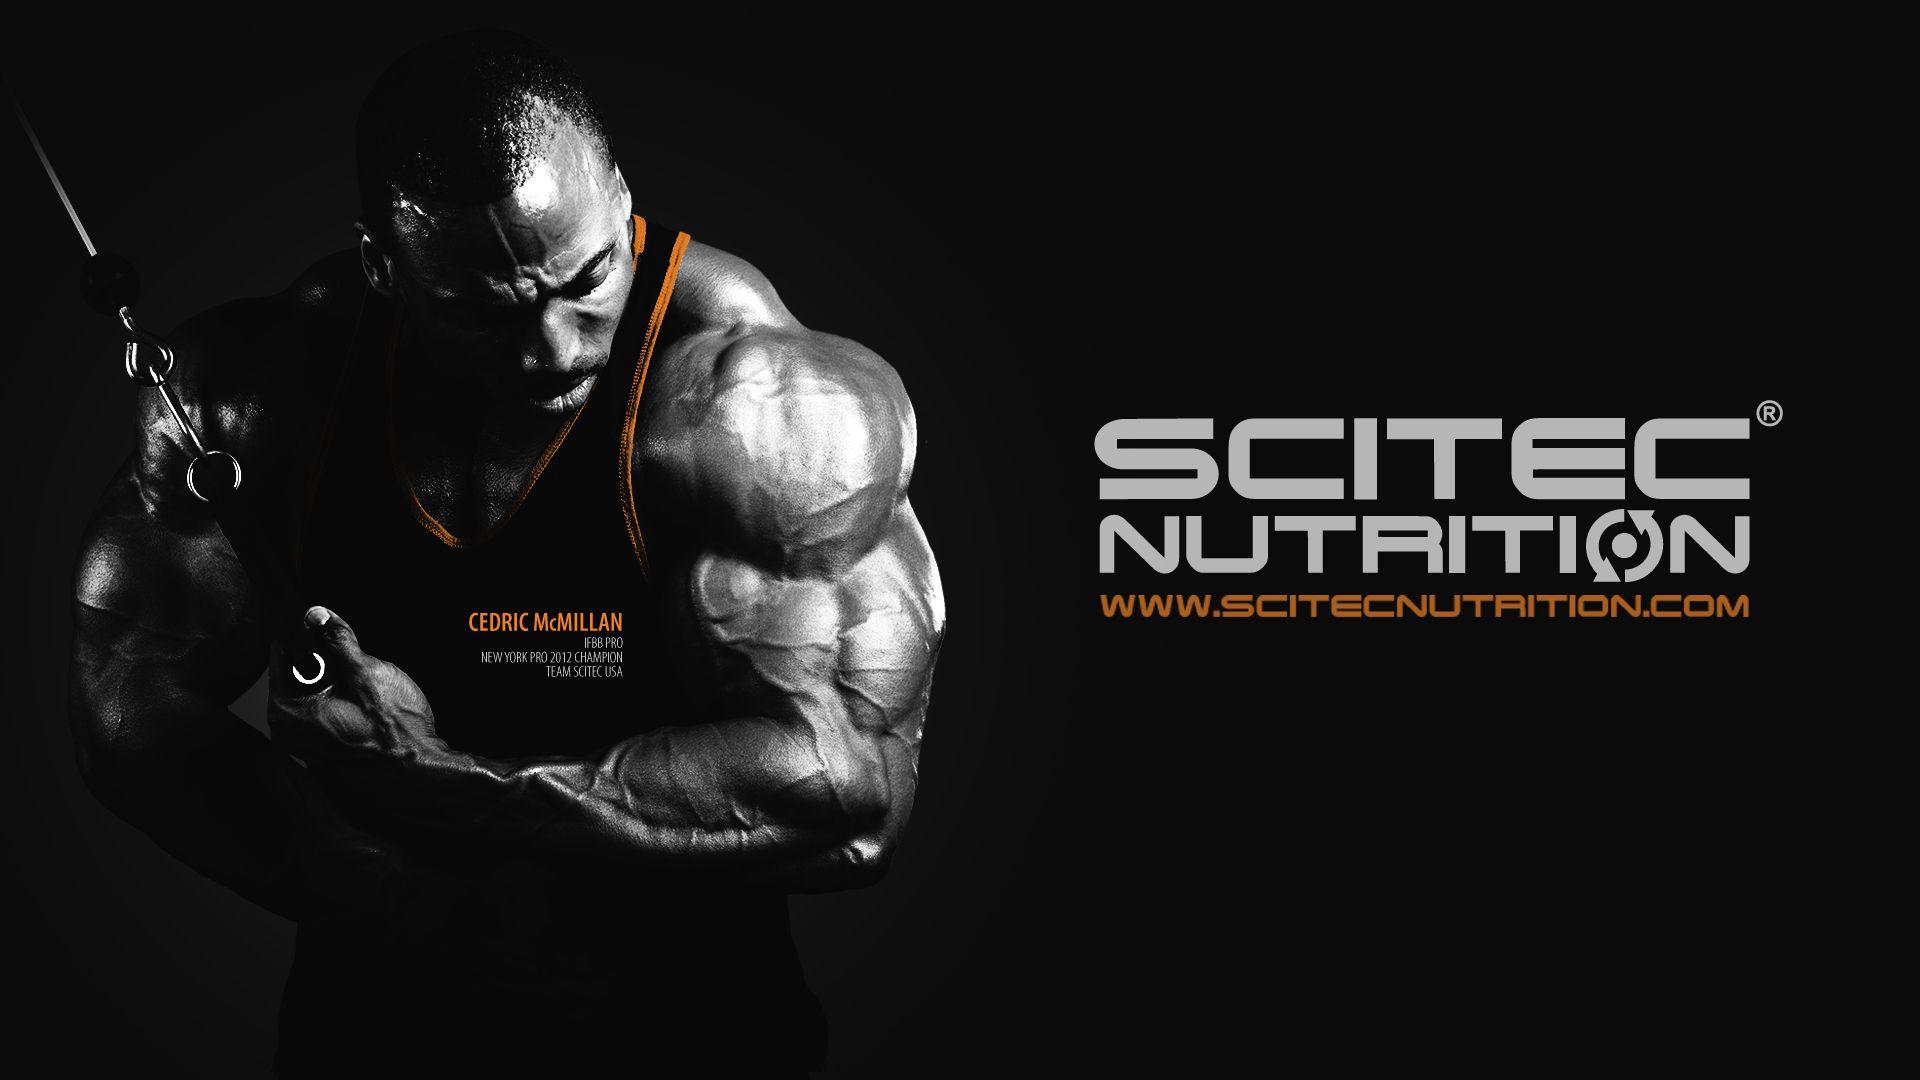 Scitec Nutrition Wallpaper | | Fitness & Bodybuilding Sportnahrung | Pinned https://www.pinterest.com/muskelfarm/ | Scitec nutrition, Bodybuilding, Nutrition